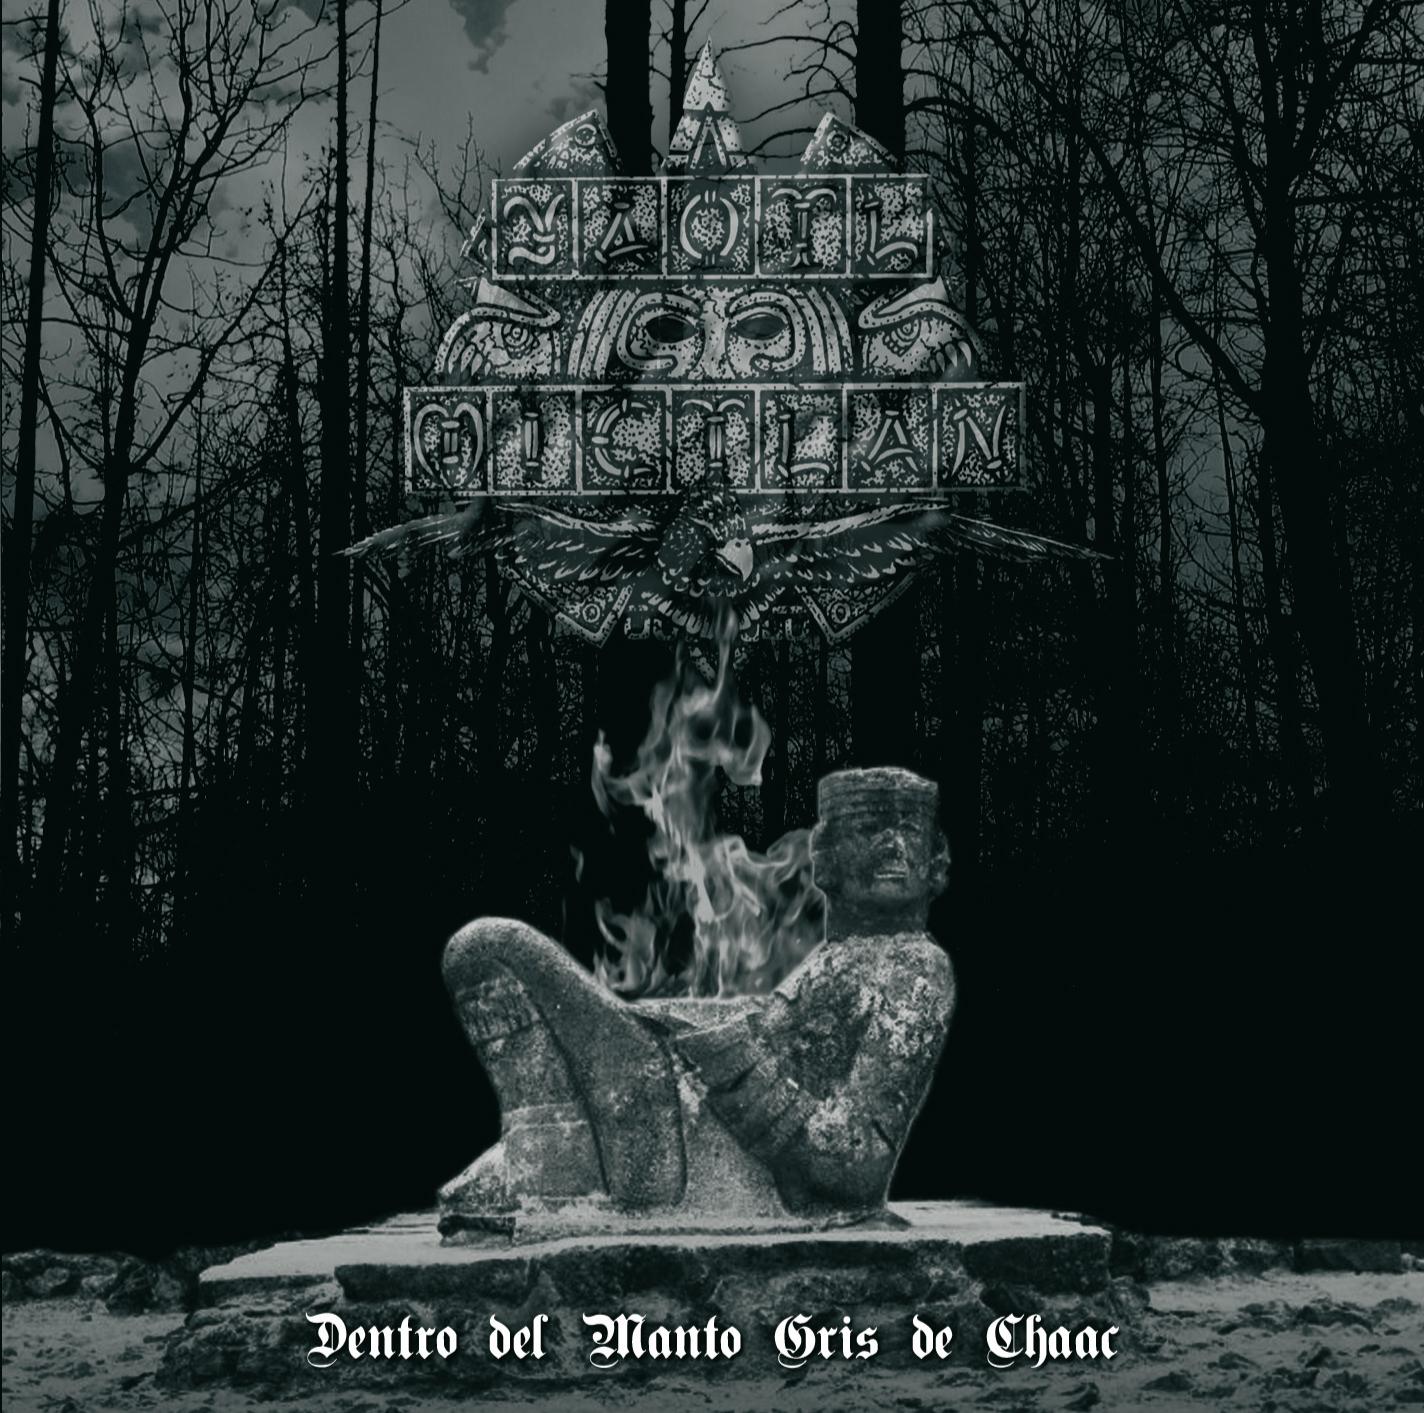 Yaotl Mictlan – Dentro del Manto Gris de Chaac Review